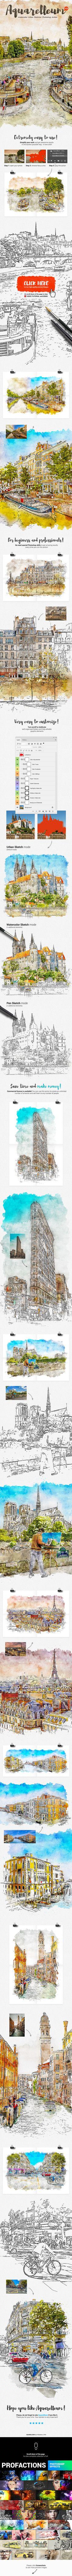 Aquarelleum - Urban Sketcher Photoshop Action - Photo Effects Actions artistic,artwork,atn,brush,creative,design,digitalart,draw,drawing,effect,modernart,paint,painting,pen,pencil,photomanipulation,professional,sketch,sketcher,sketching,tutorial,urban,watercolor